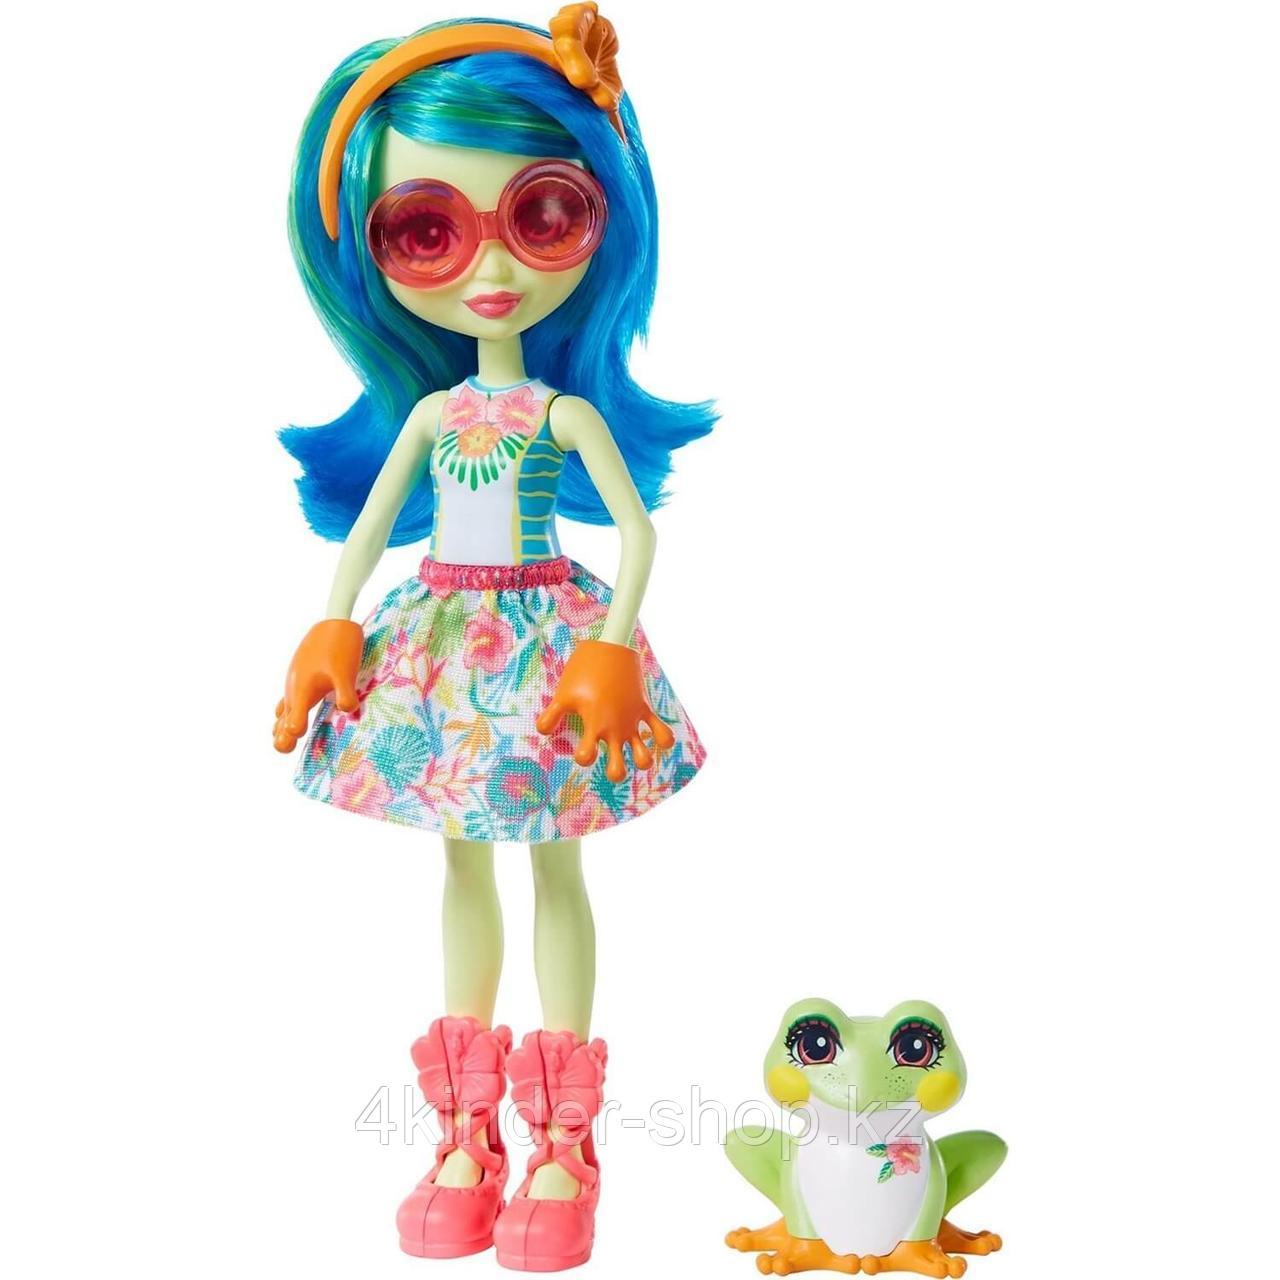 Энчантималс Enchantimals кукла с питомцем Тамика Квакша и Берст GFN43 - фото 1